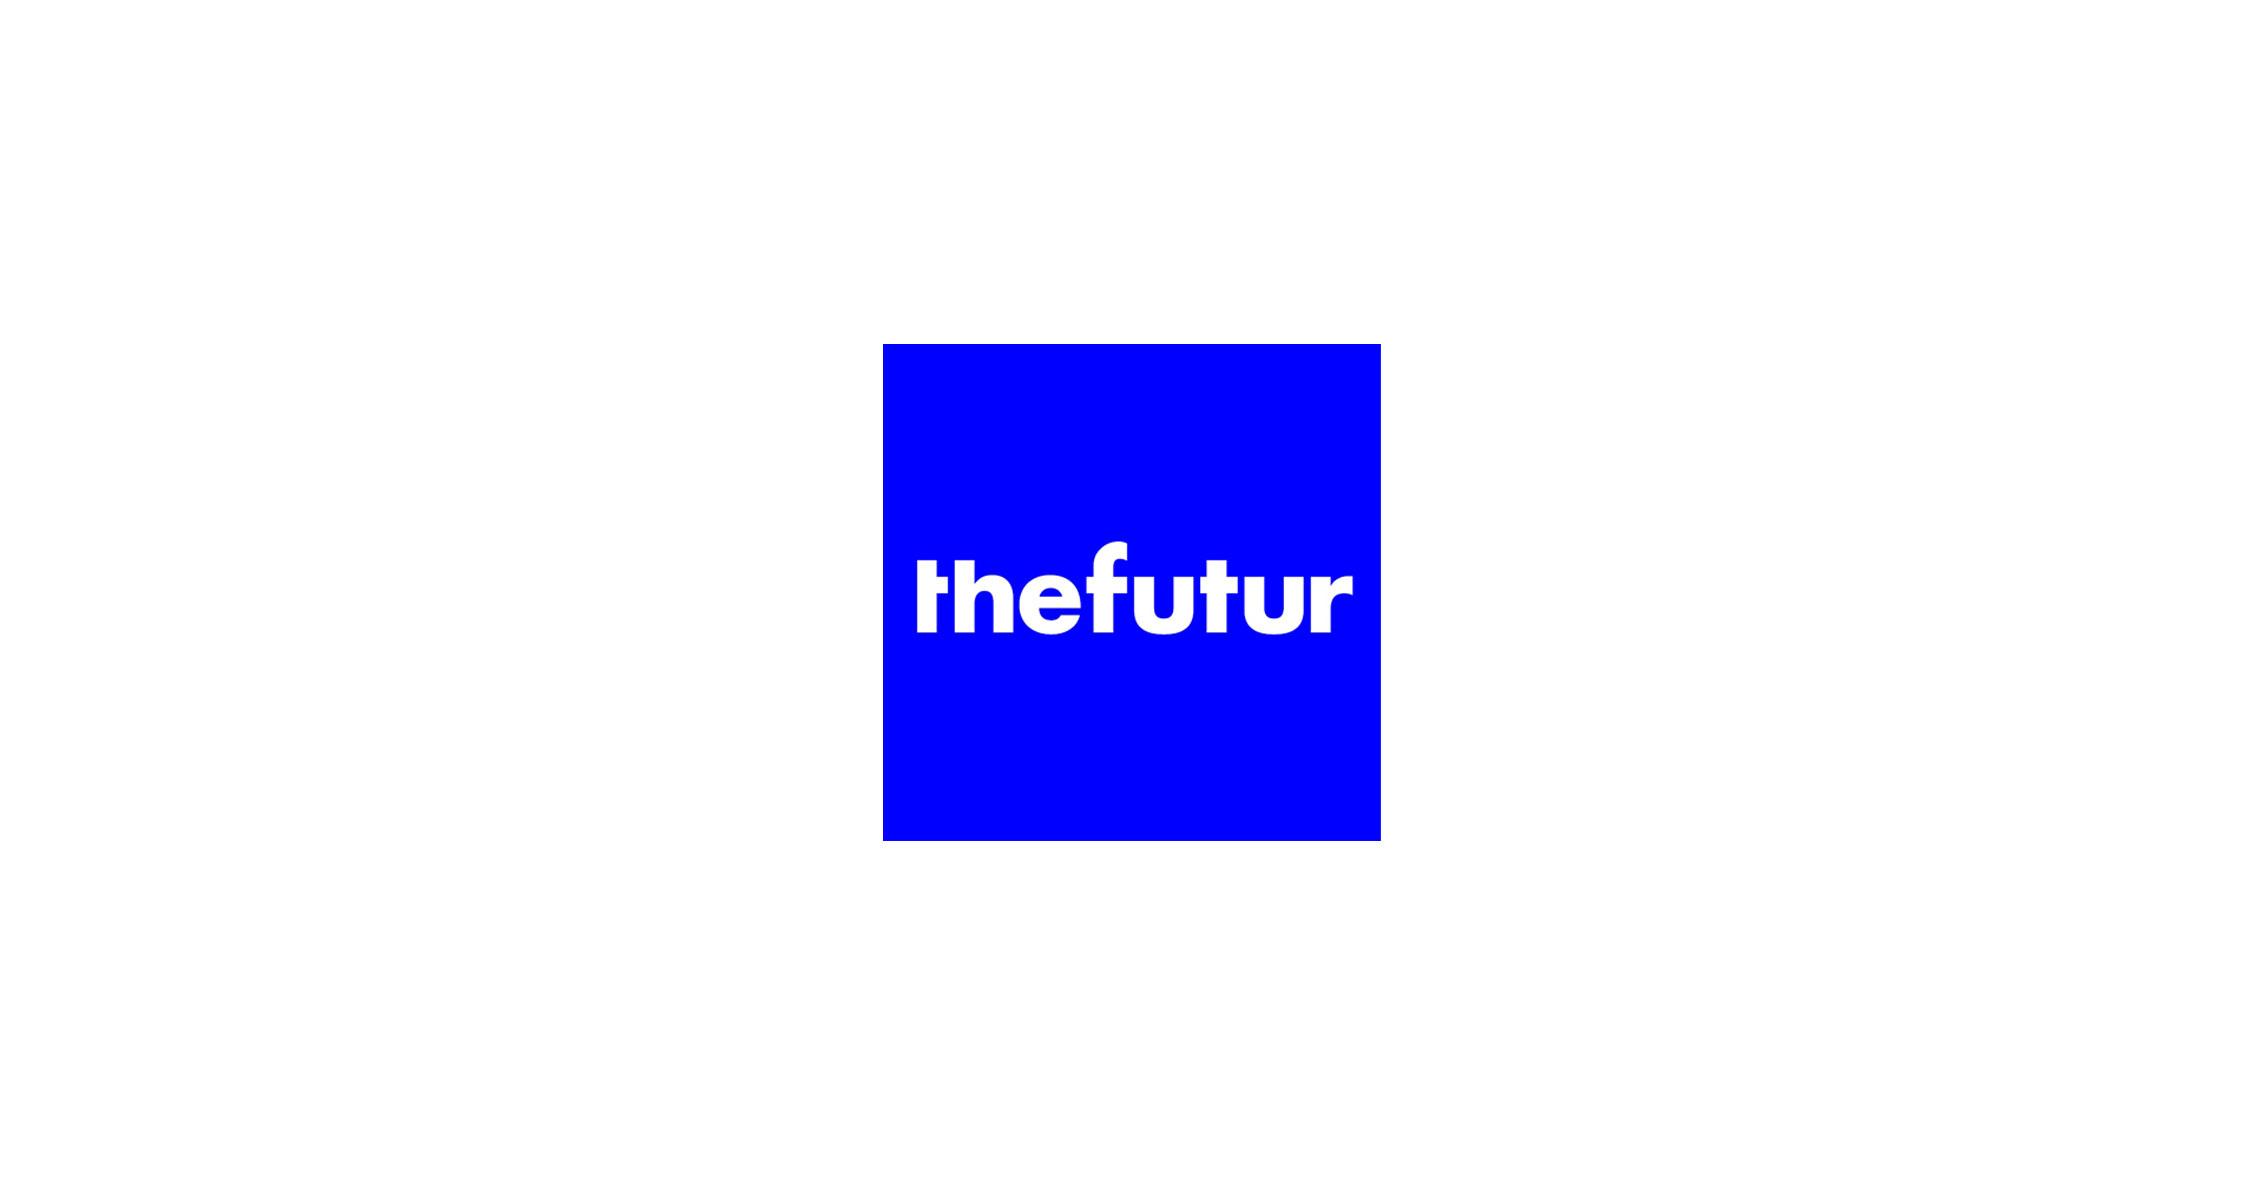 The Futur logo